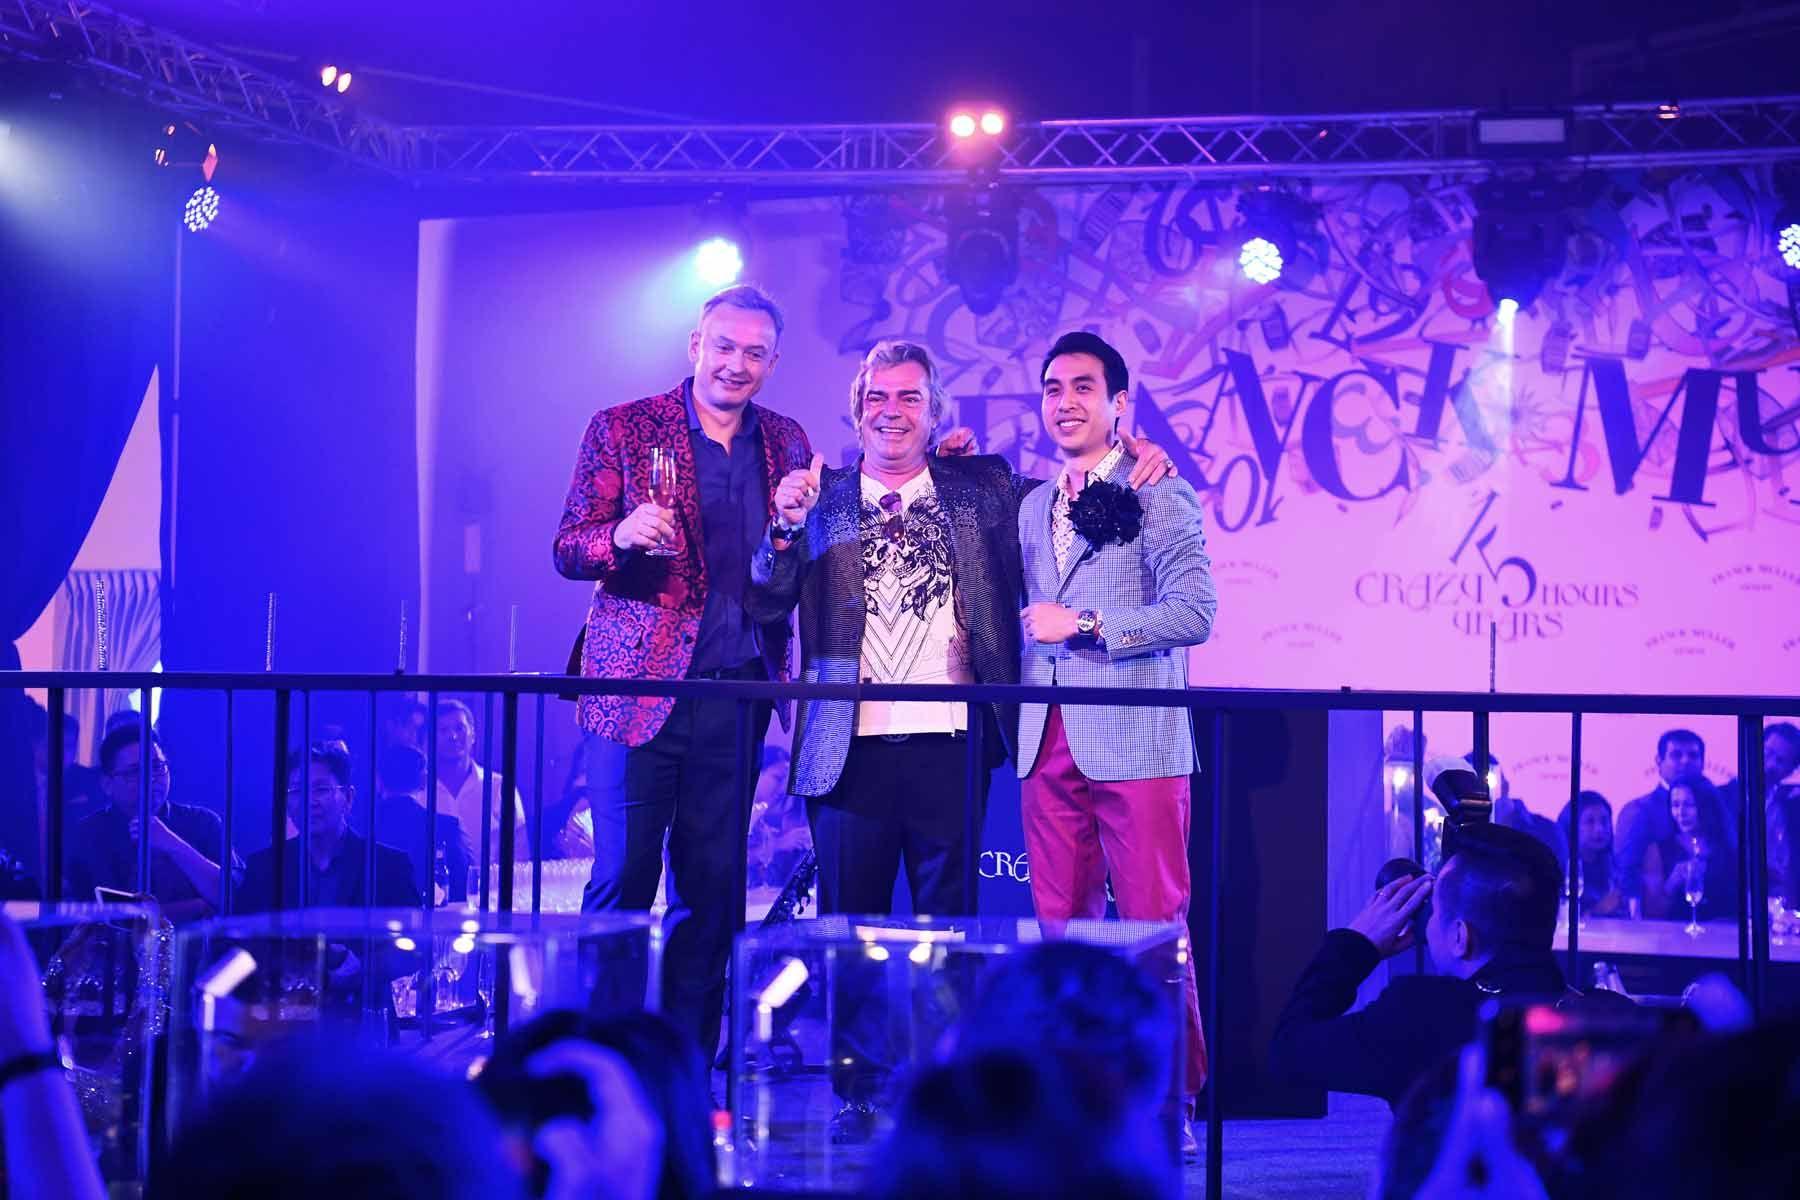 Nicholas Rudaz, Franck Muller, Kingston Chu